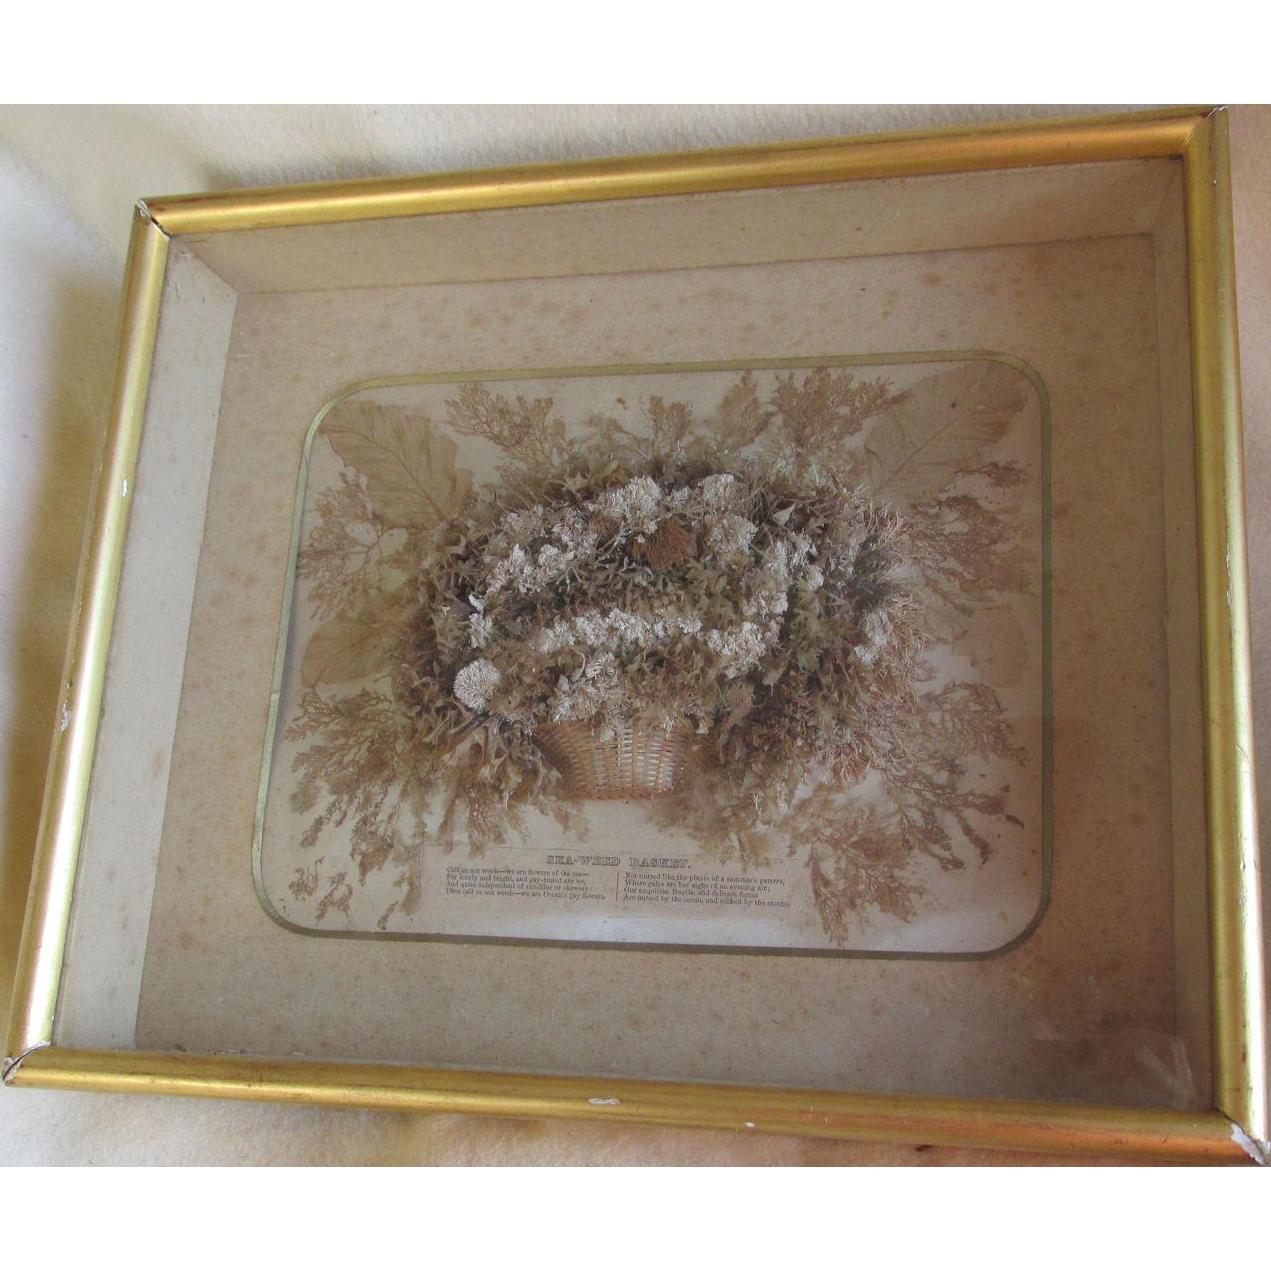 Rare 19thC Seaweed Specimen Basket in Shadowbox Frame